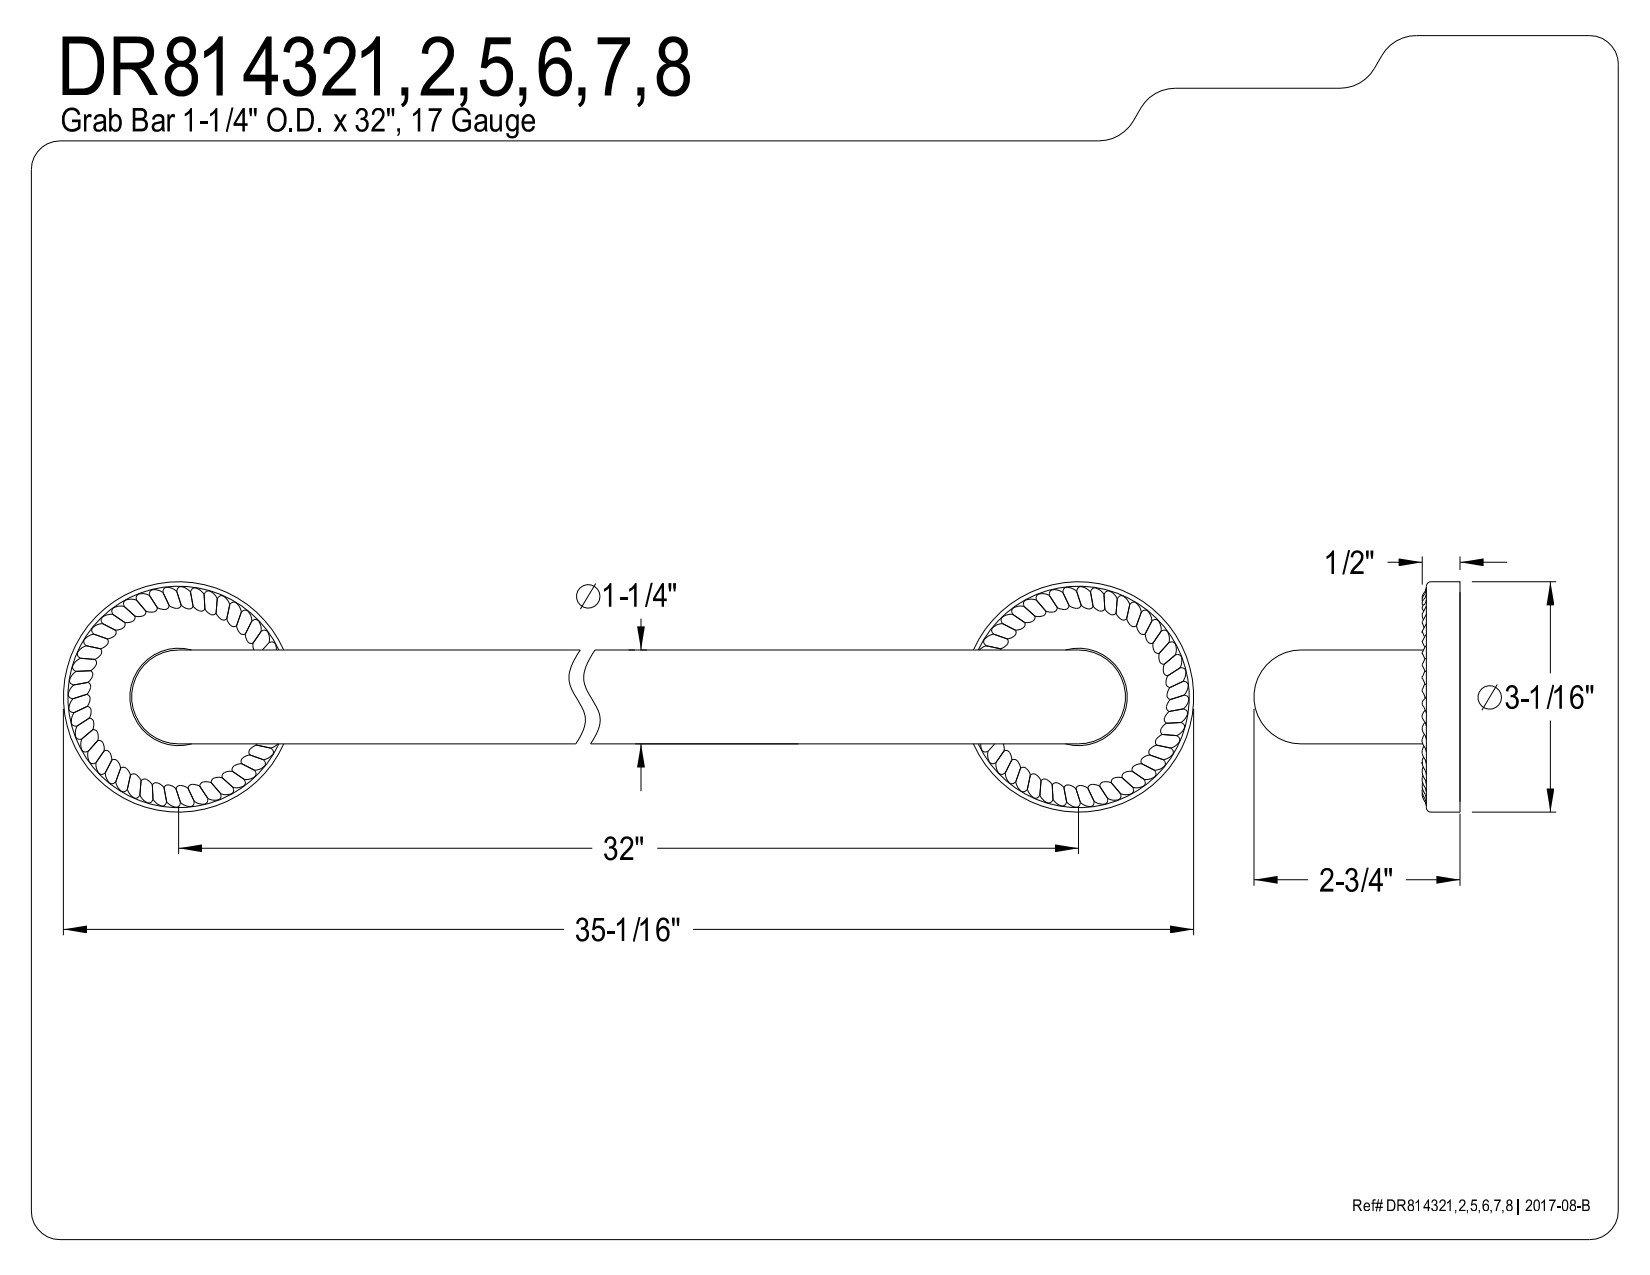 Kingston Brass DR814325 Designer Trimscape Laurel Decor 32-Inch Grab Bar with 1.25-Inch Outer Diameter, Oil Rubbed Bronze